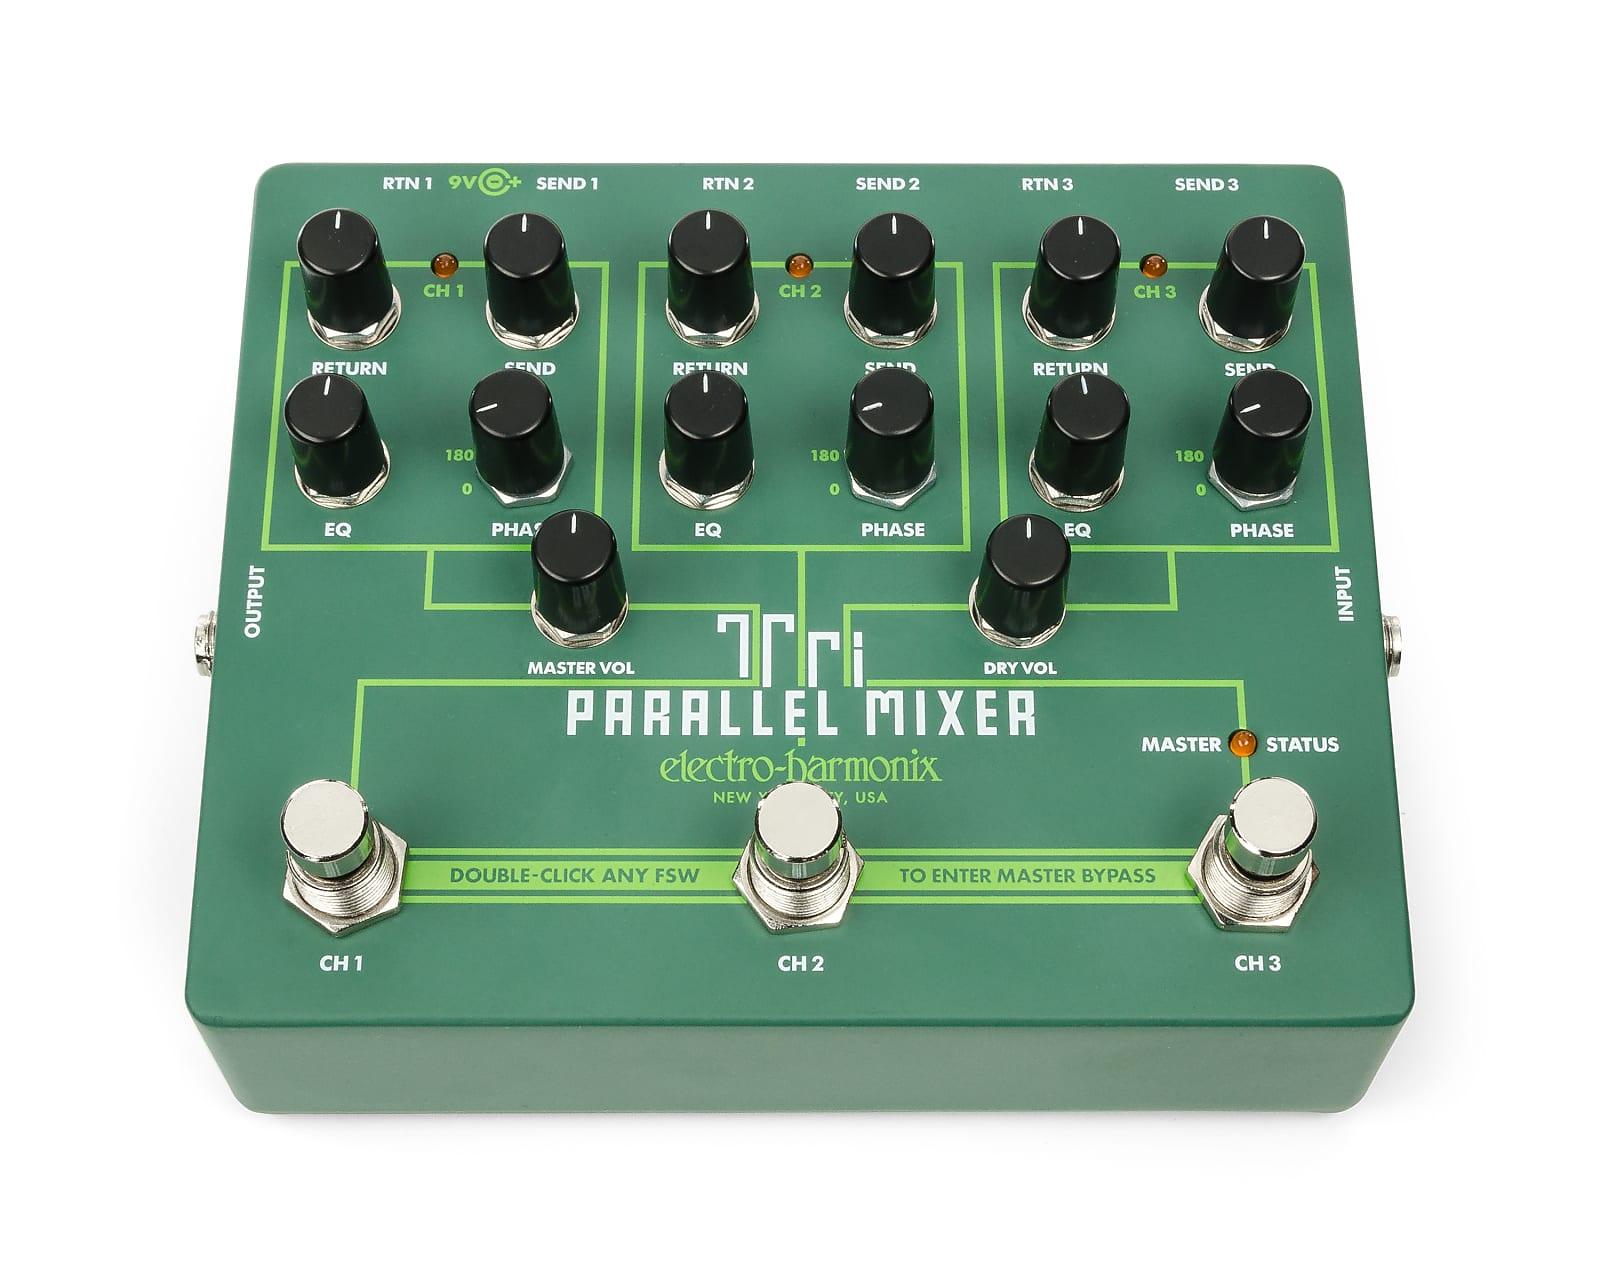 Electro-Harmonix EHX Tri Parallel Mixer Effects Loop Mixer / Switcher Pedal